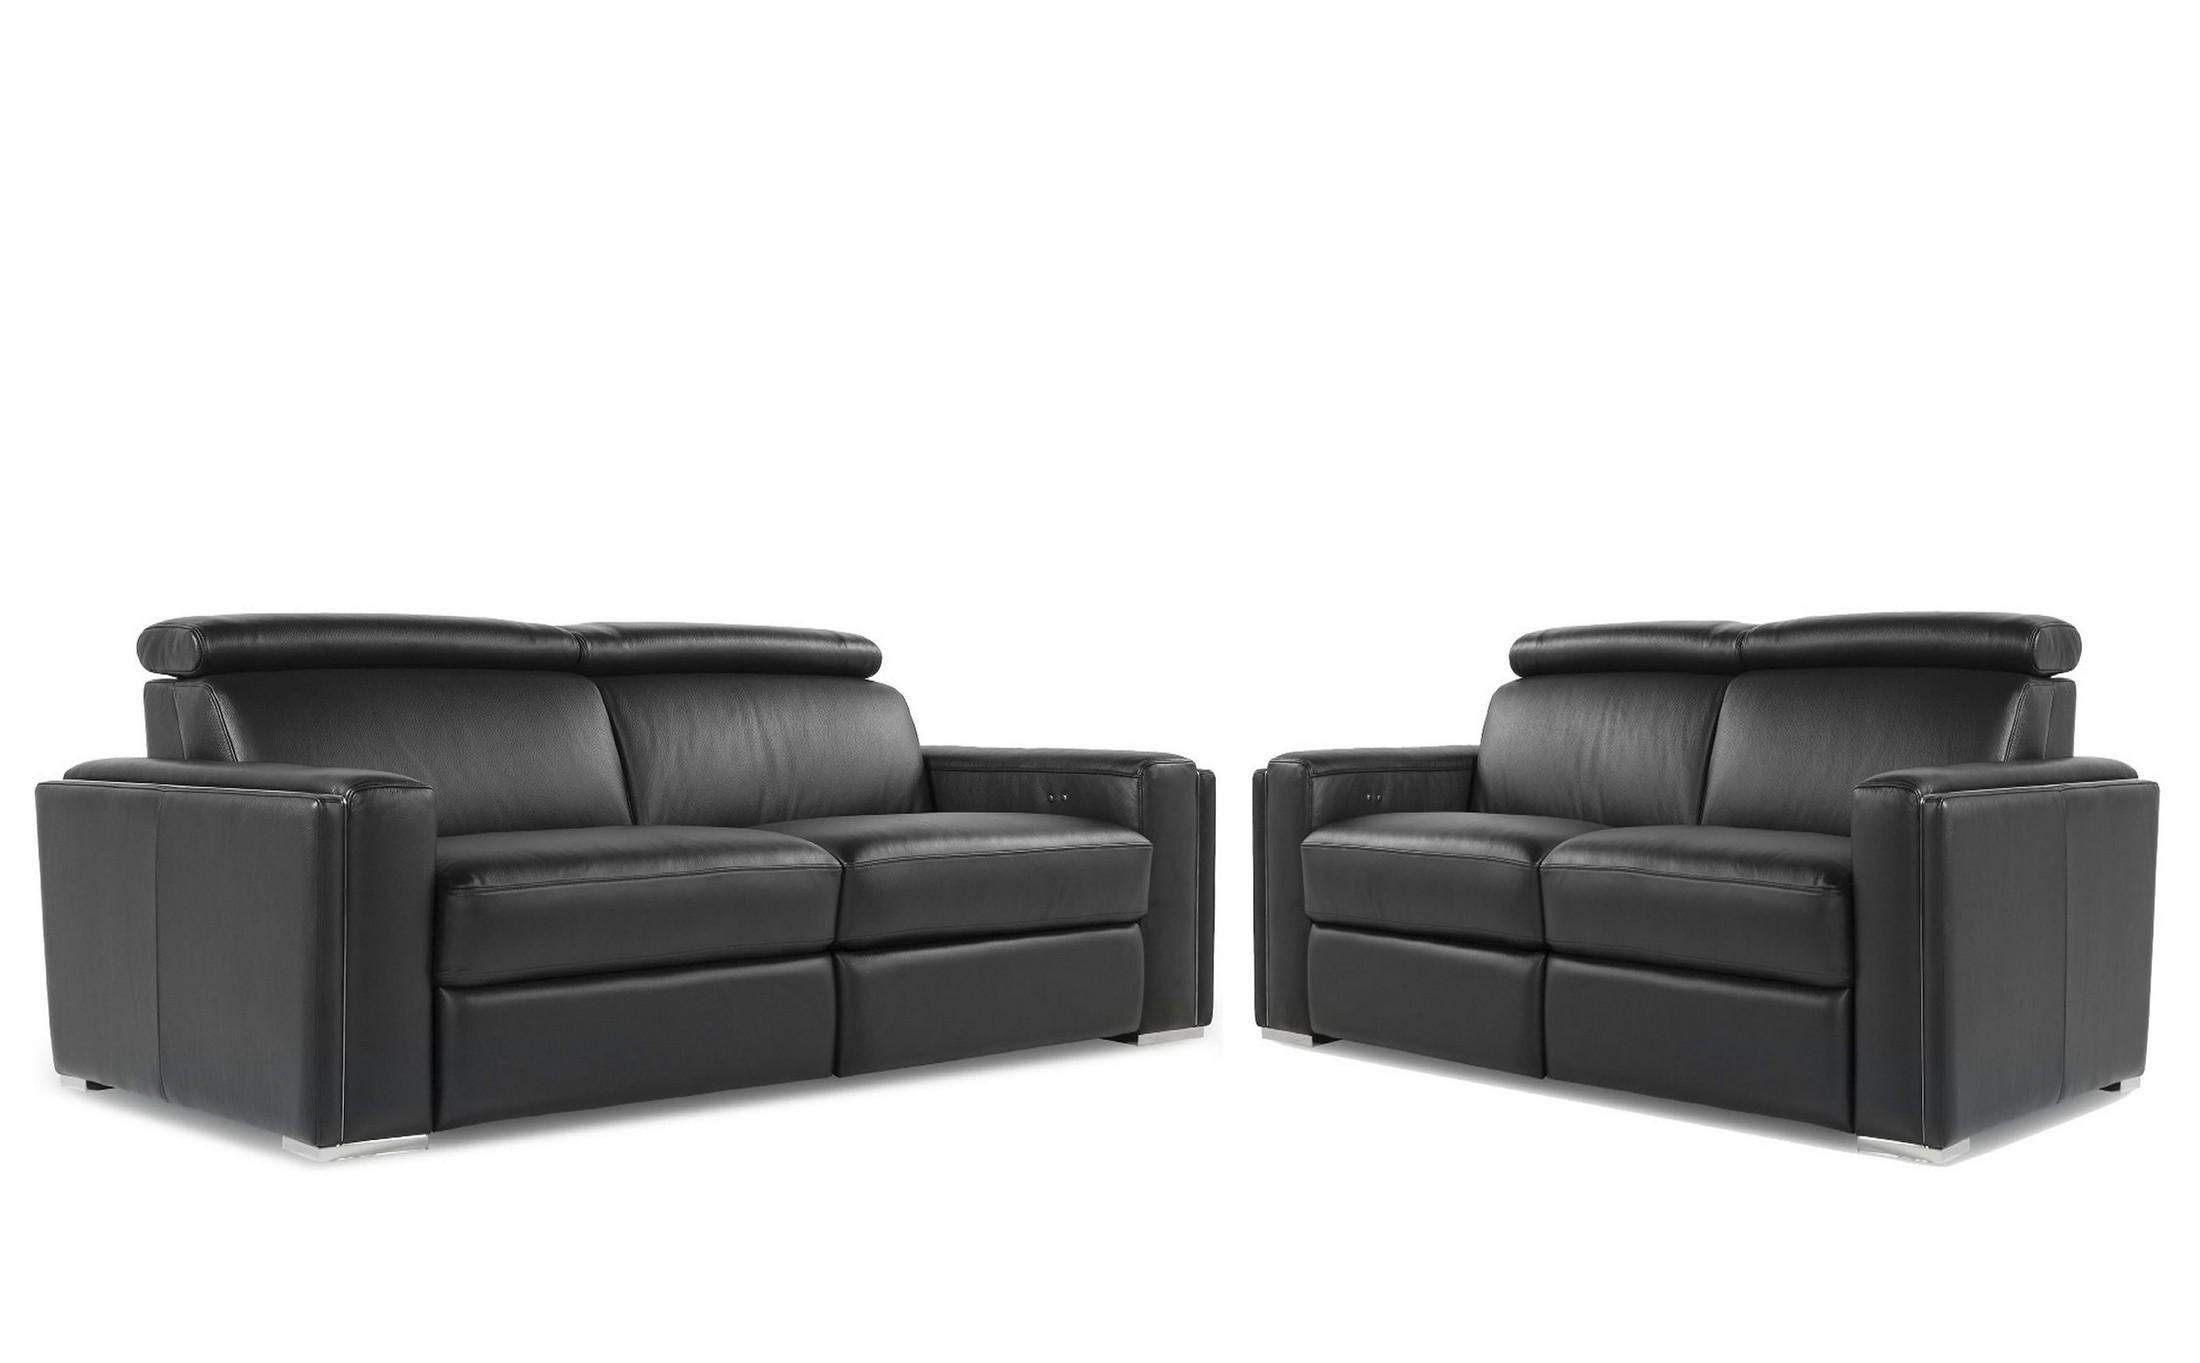 Image of item ellie black top grain leather reclining living room set